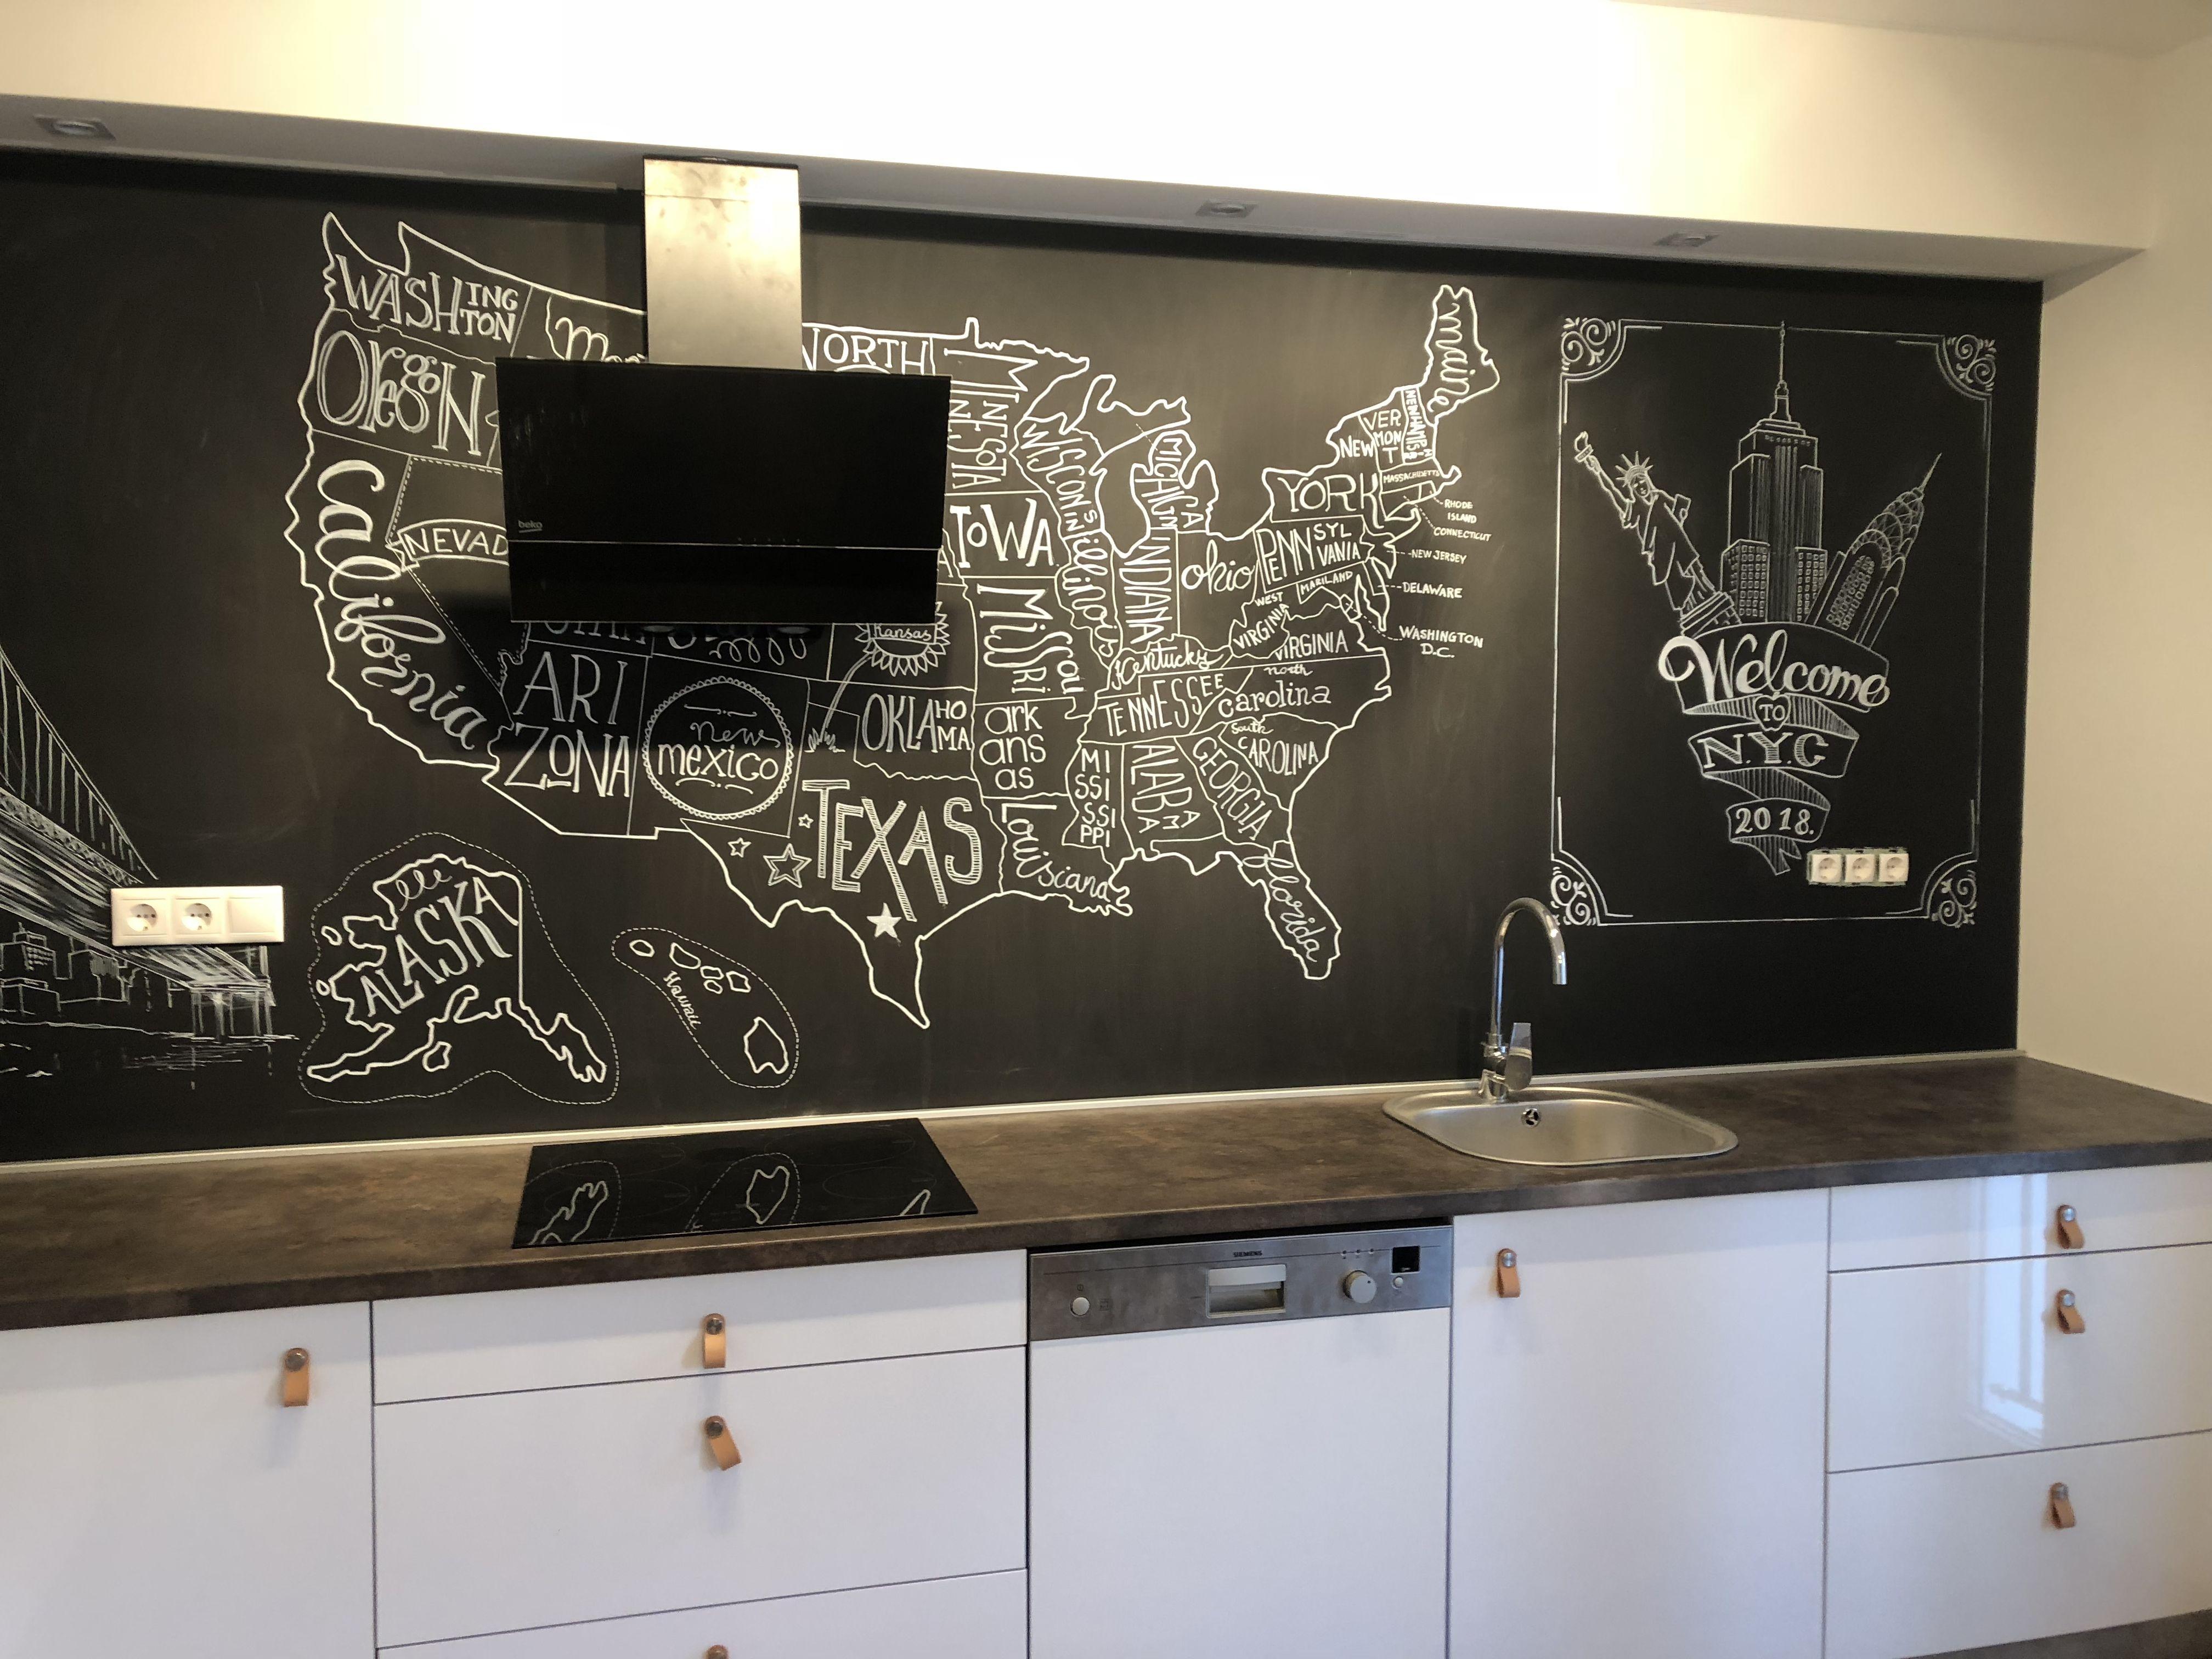 Kitchen Kitchendesign Chalkboard Chalkpaint Kitchen